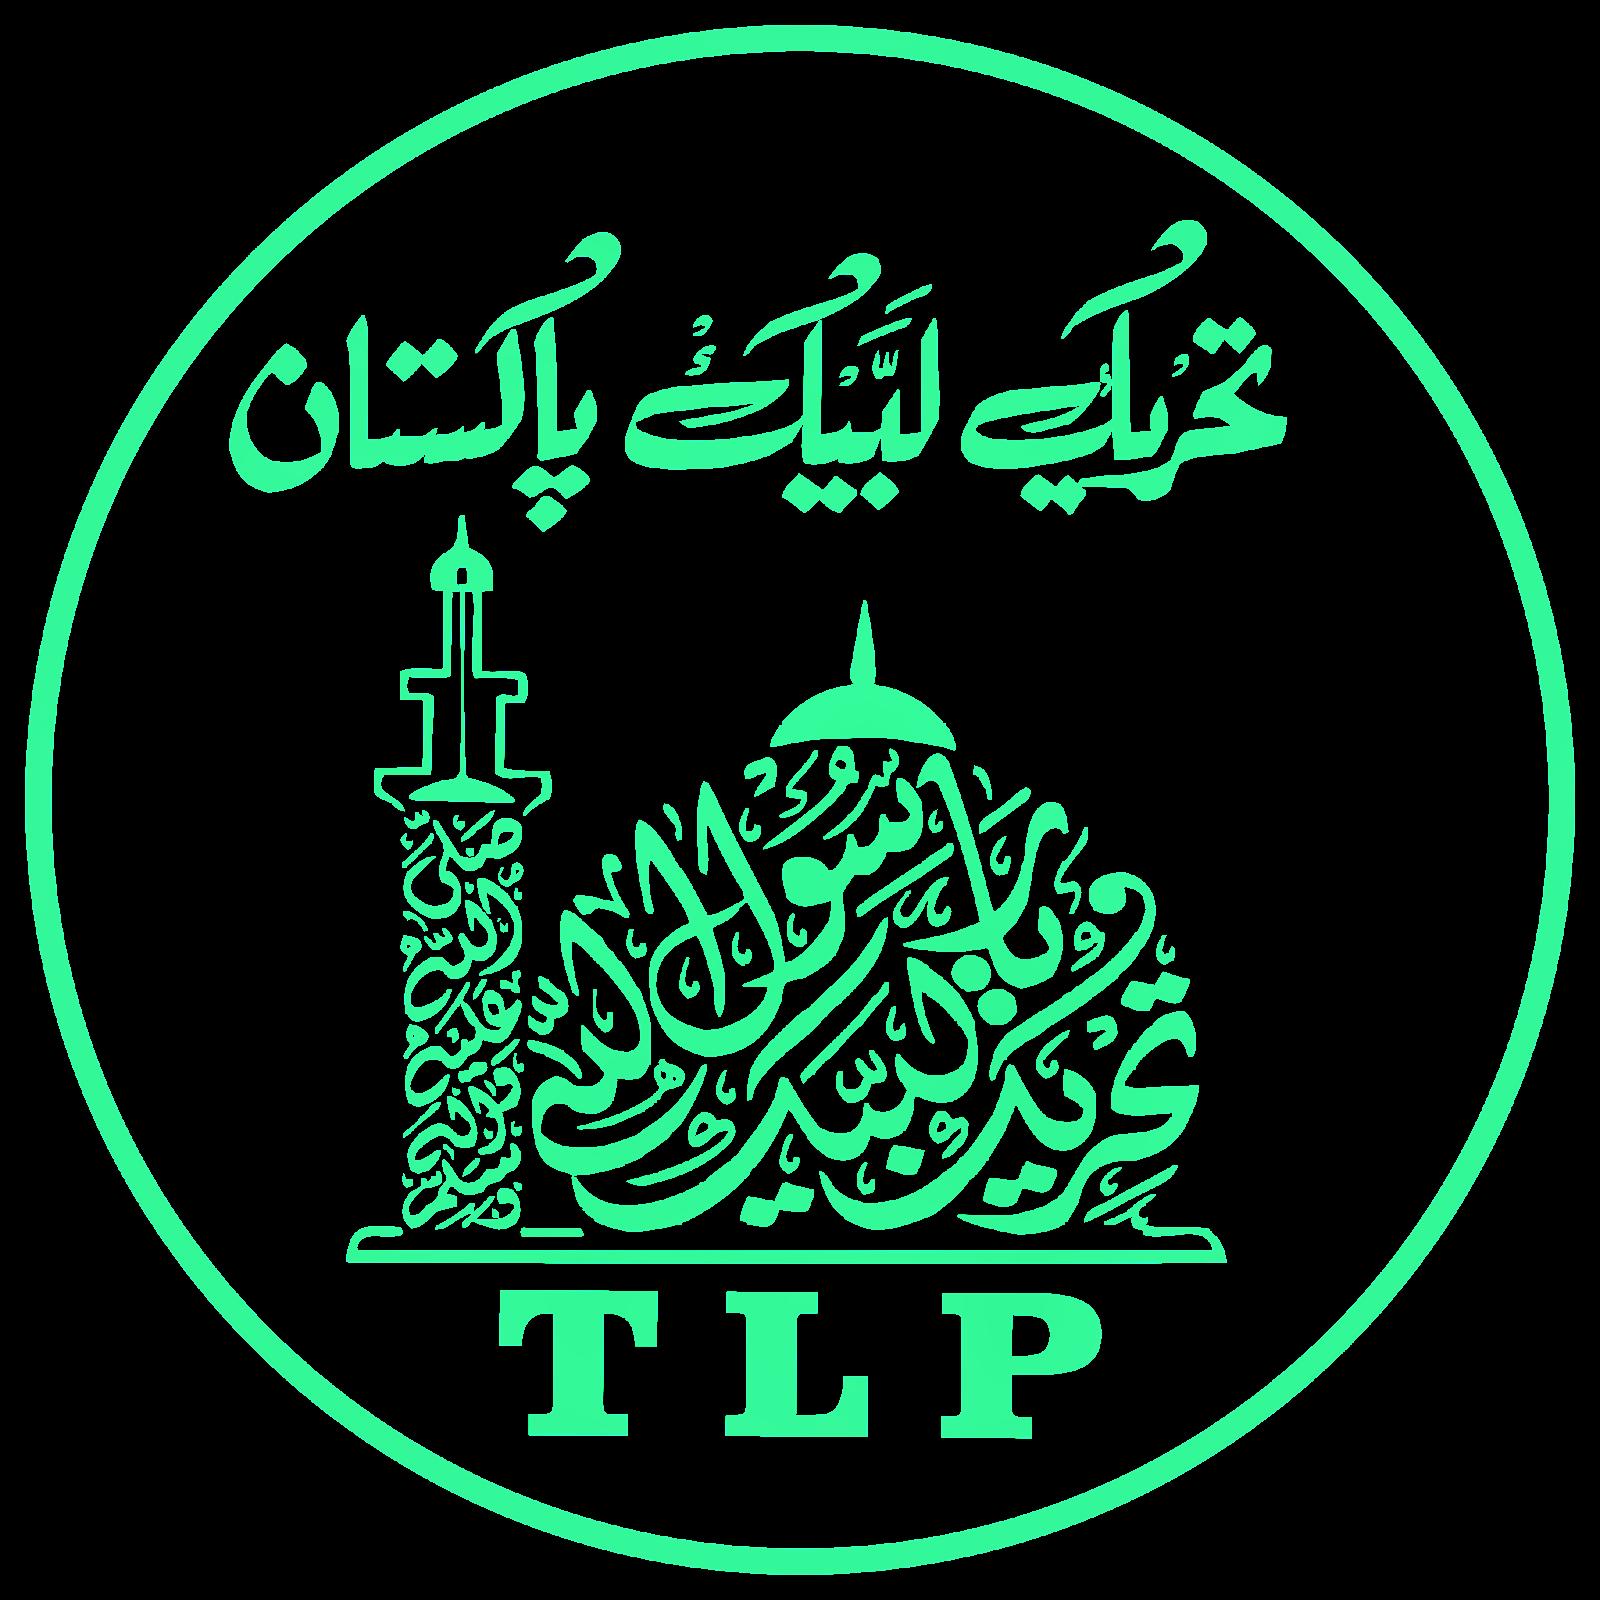 Tahreek-e-Labbaik Pakistan